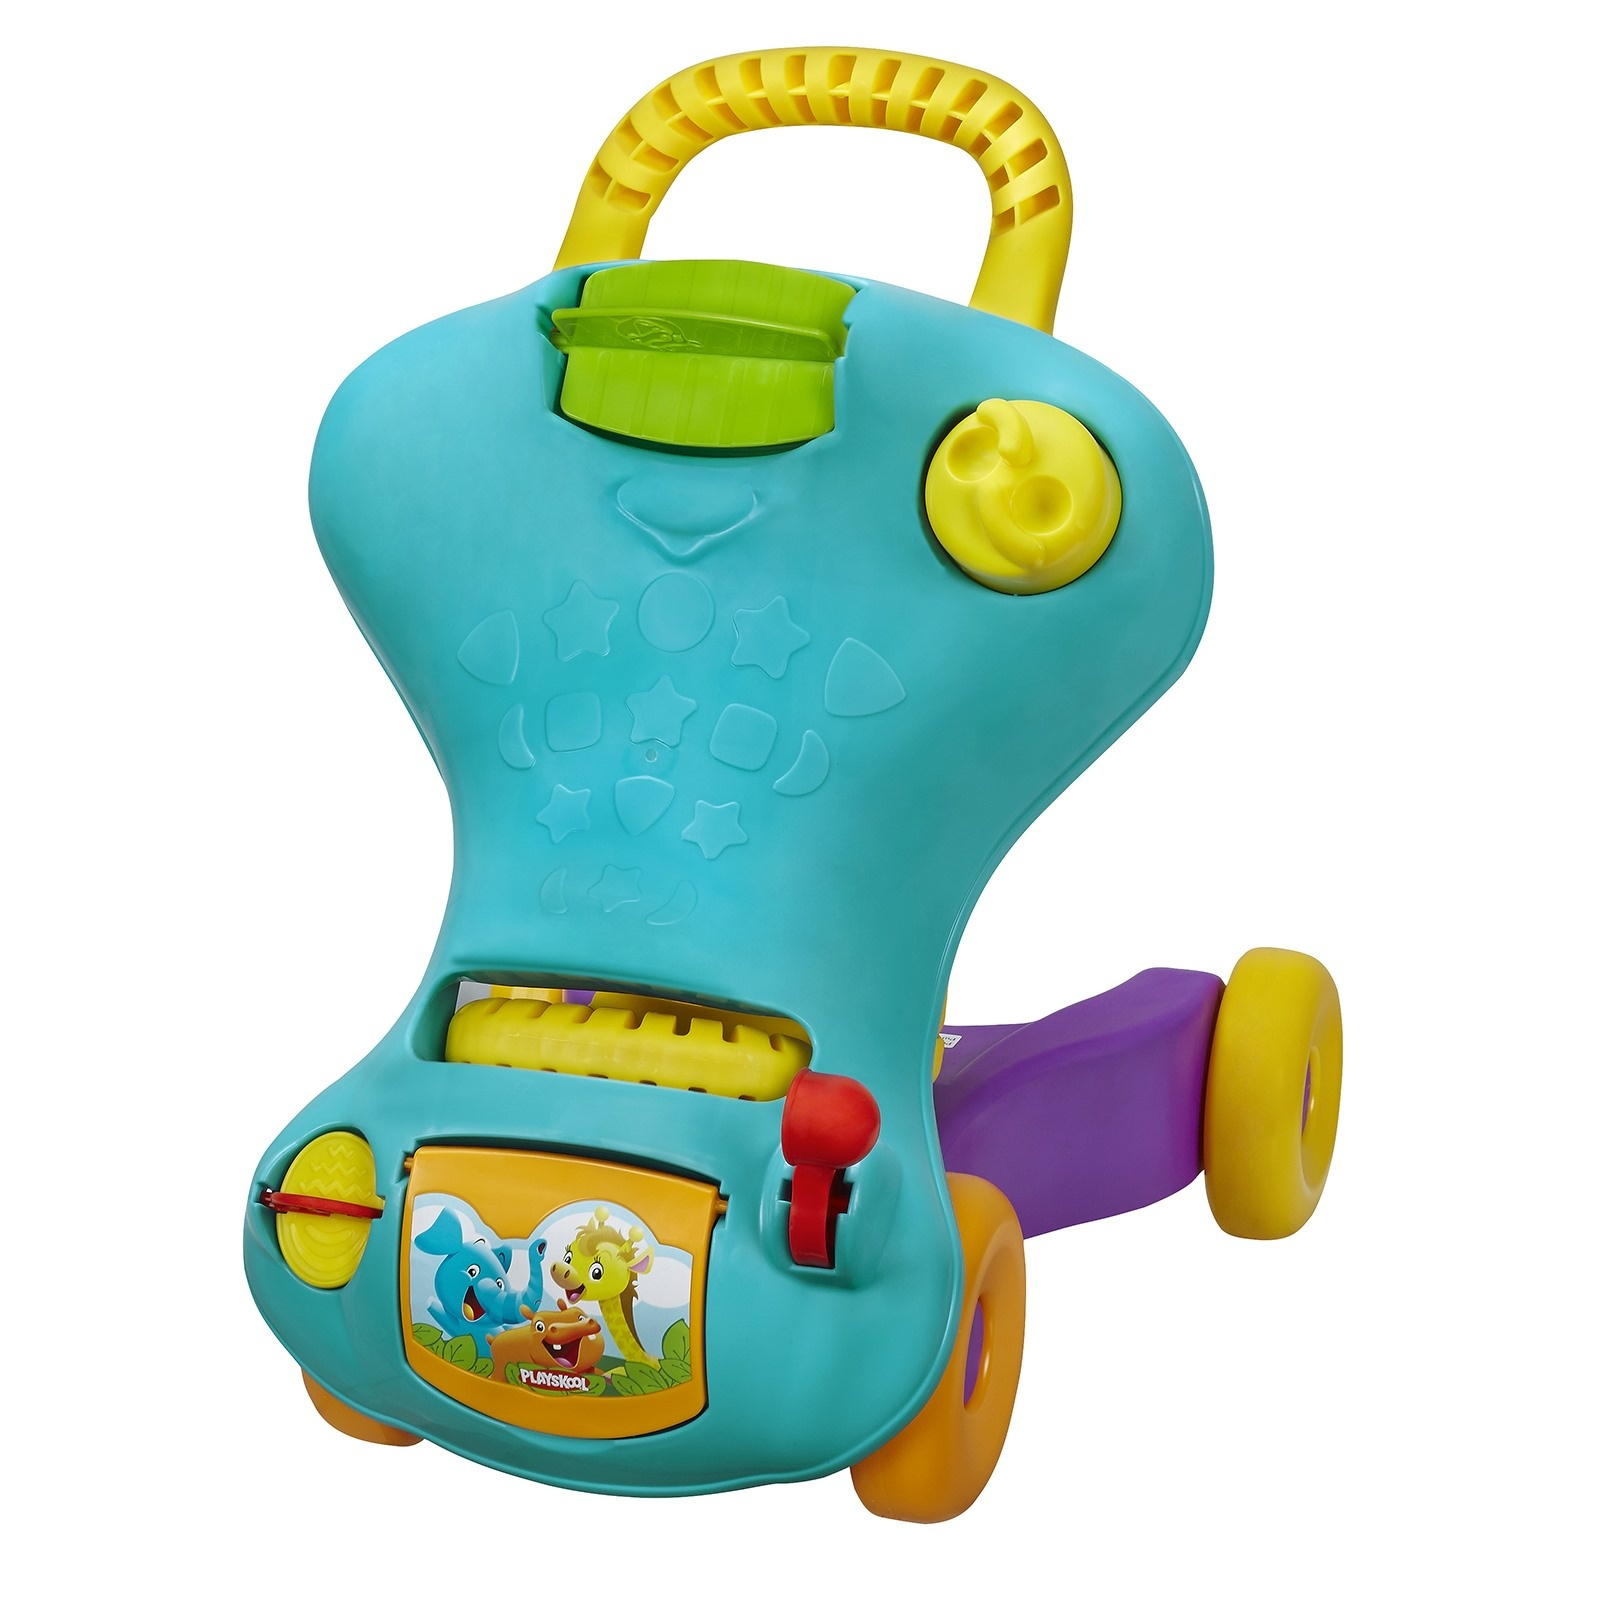 ebebek Playskool My First Car Talakar Walker For Baby Walker Musical Wheelchair Walker Baby Walker With Wheel